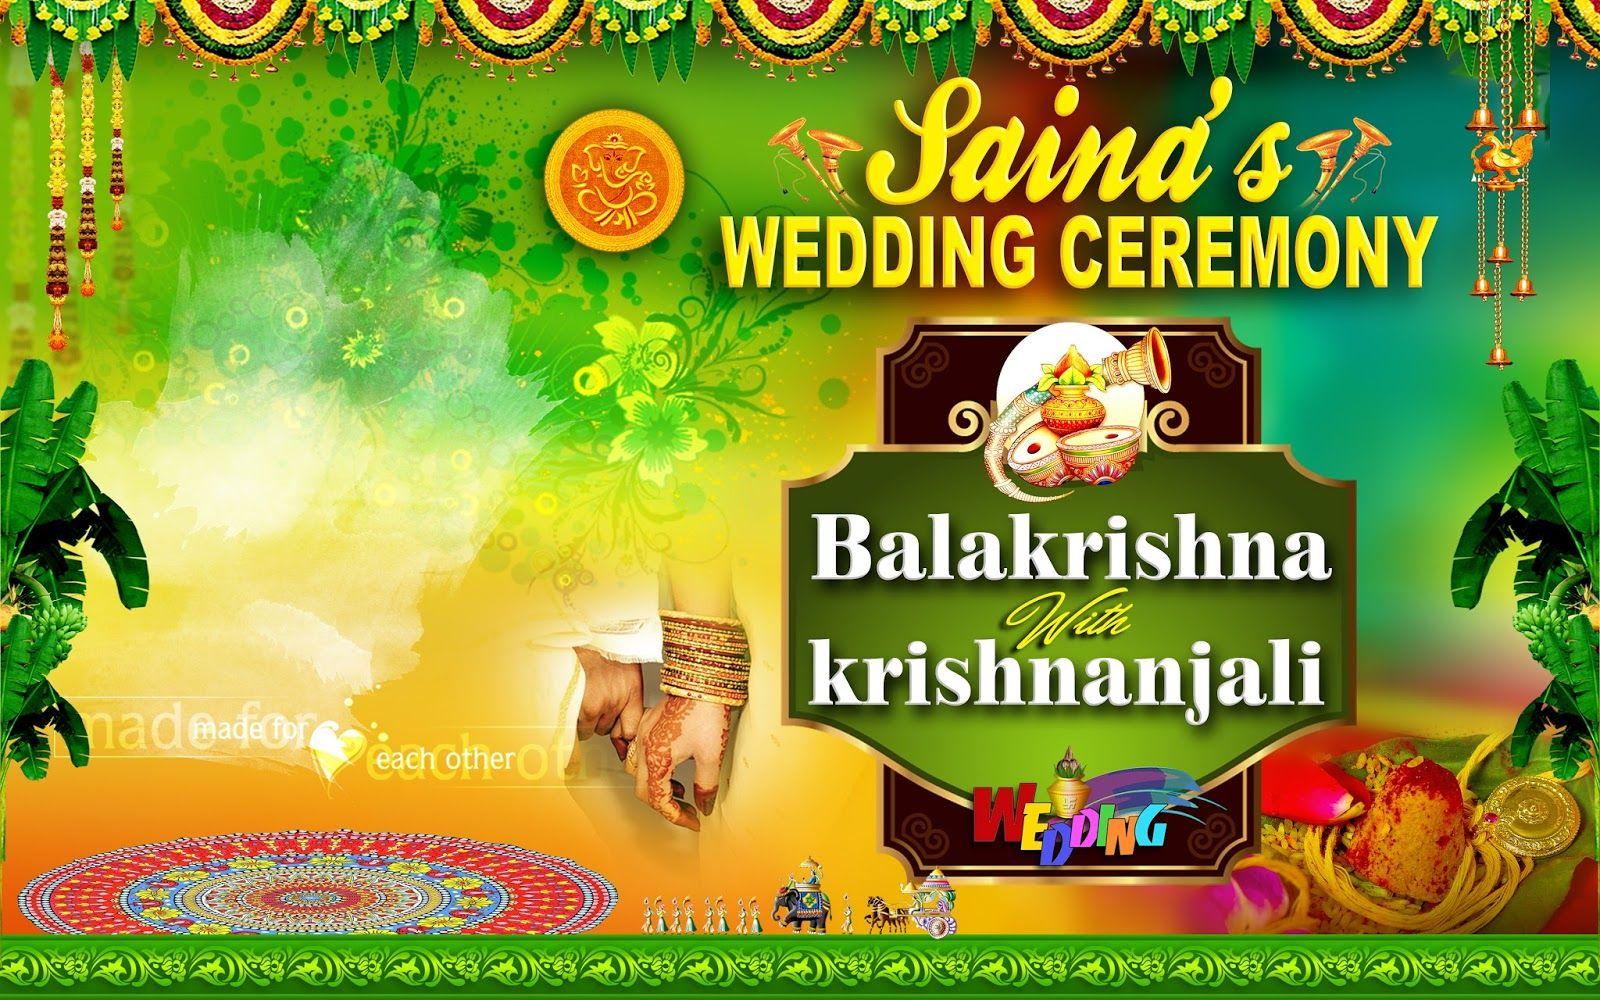 Wedding Banner Design Free Download Naveengfx Flex Banner